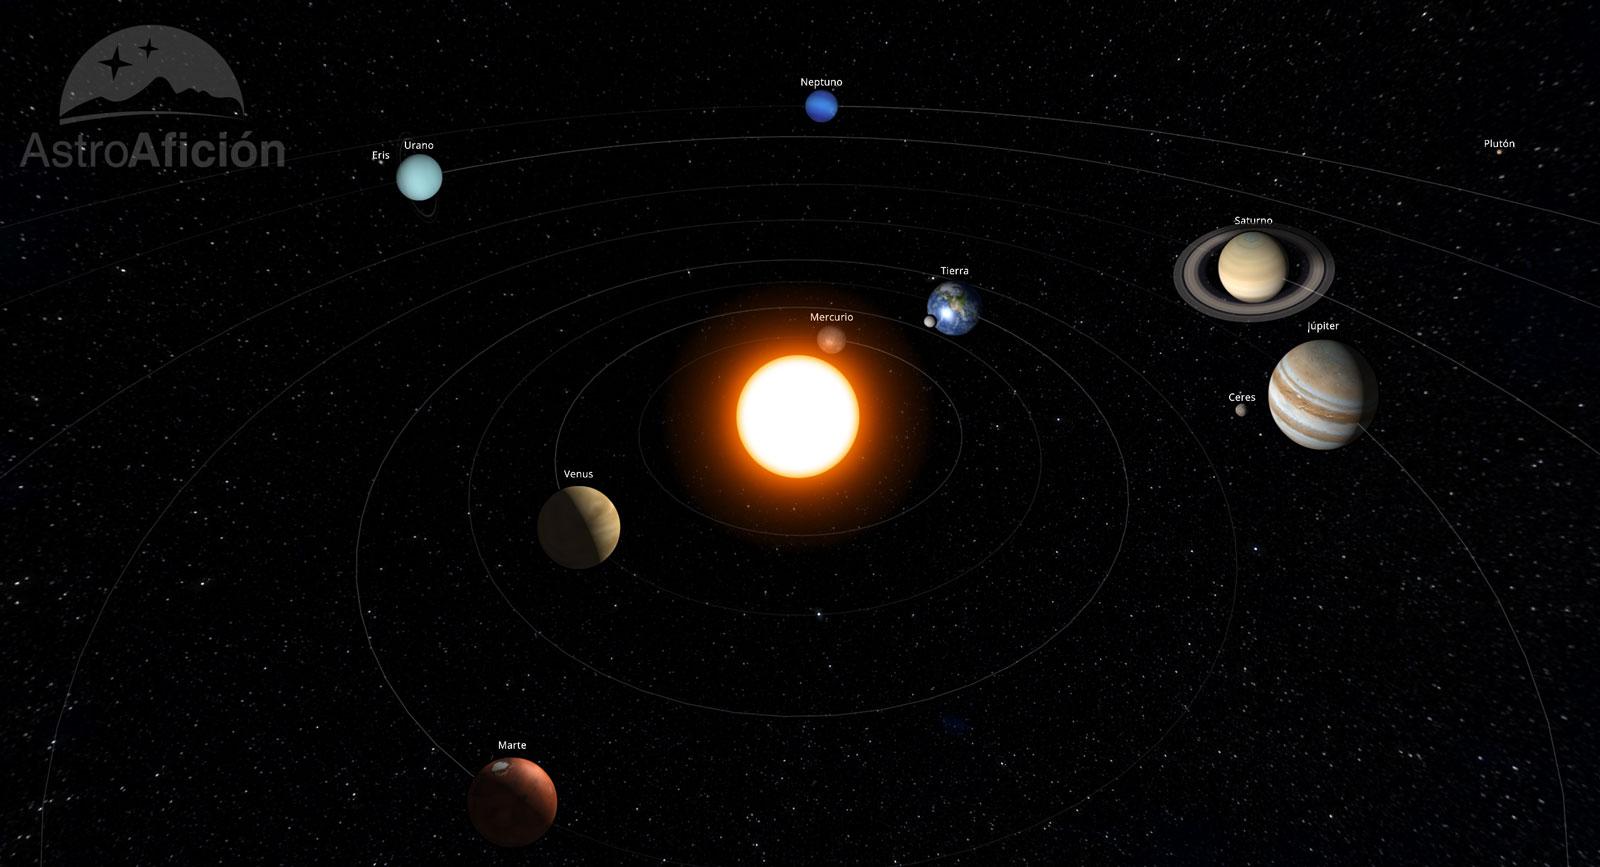 Efemérides astronómicas: Agosto de 2019 - AstroAficion